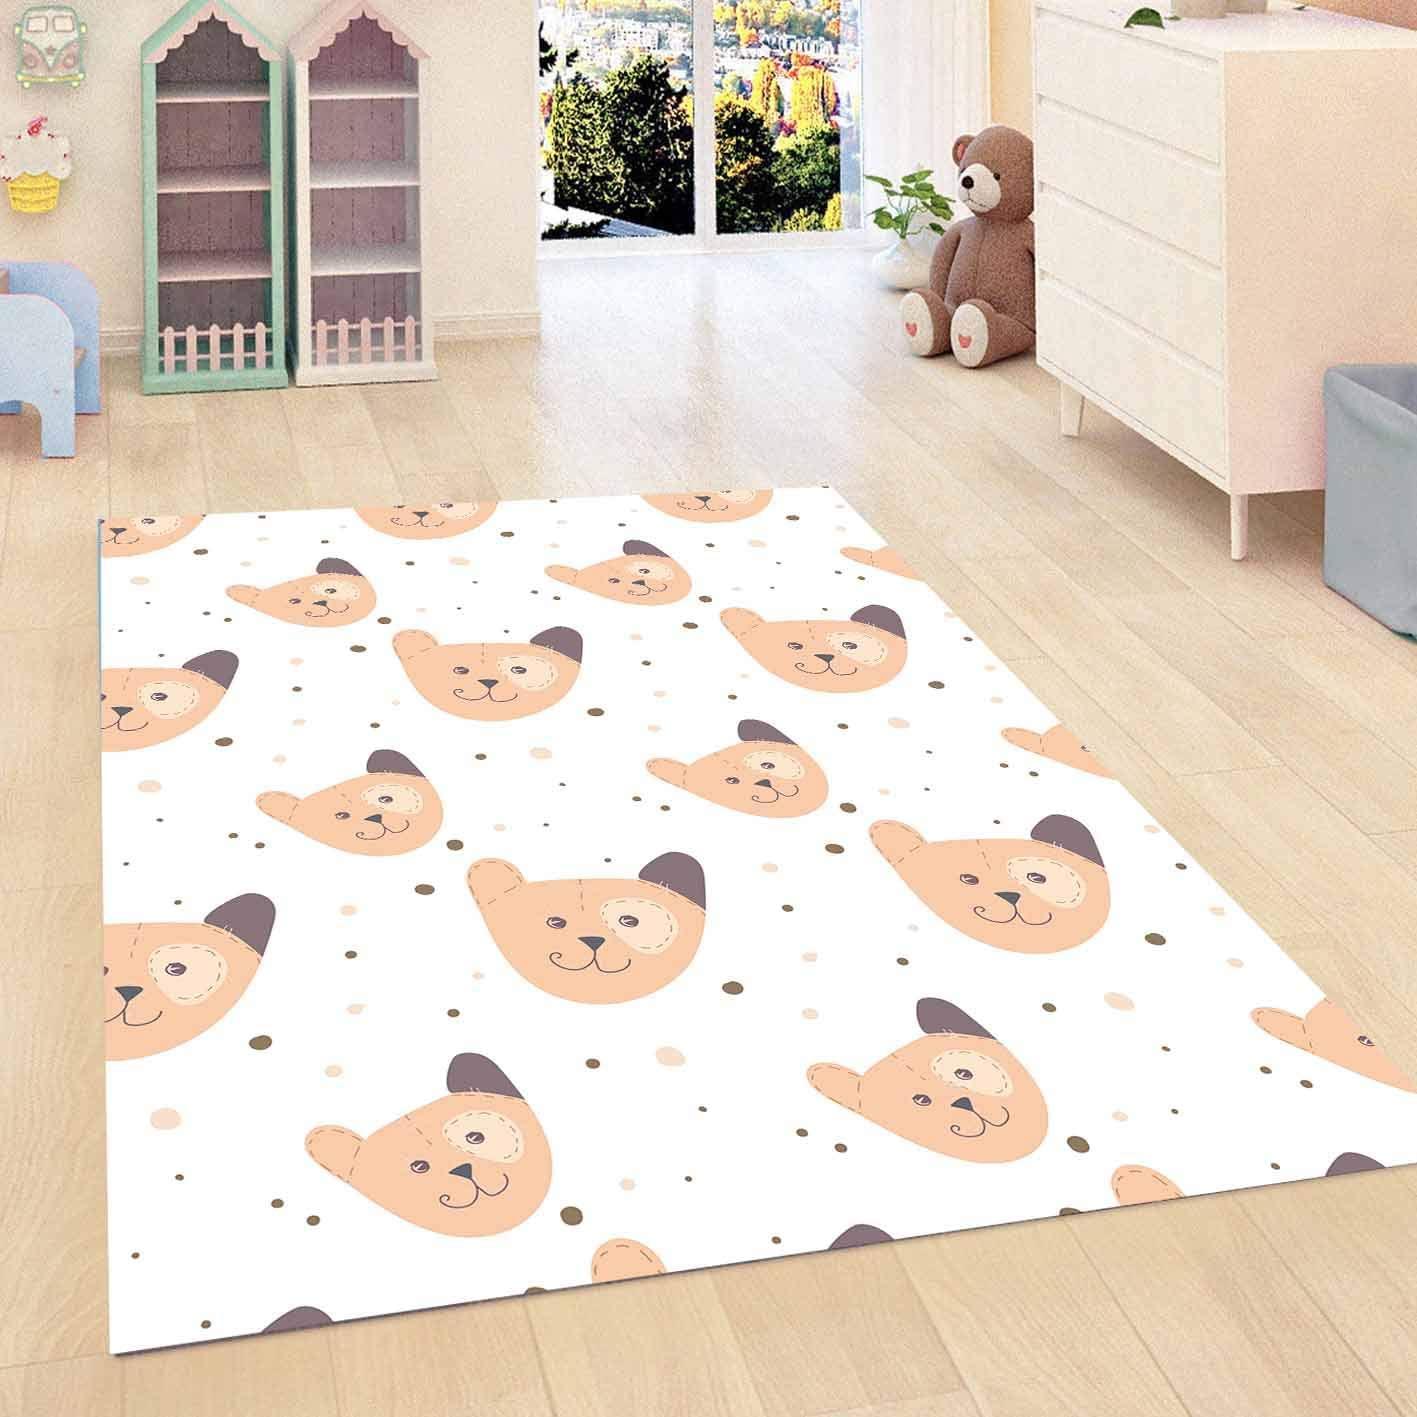 Else Brown Teddy Bears Animals 3D Pattern Print Non Slip Microfiber Children Kids Room Decorative Area Rug Kids Game Mat